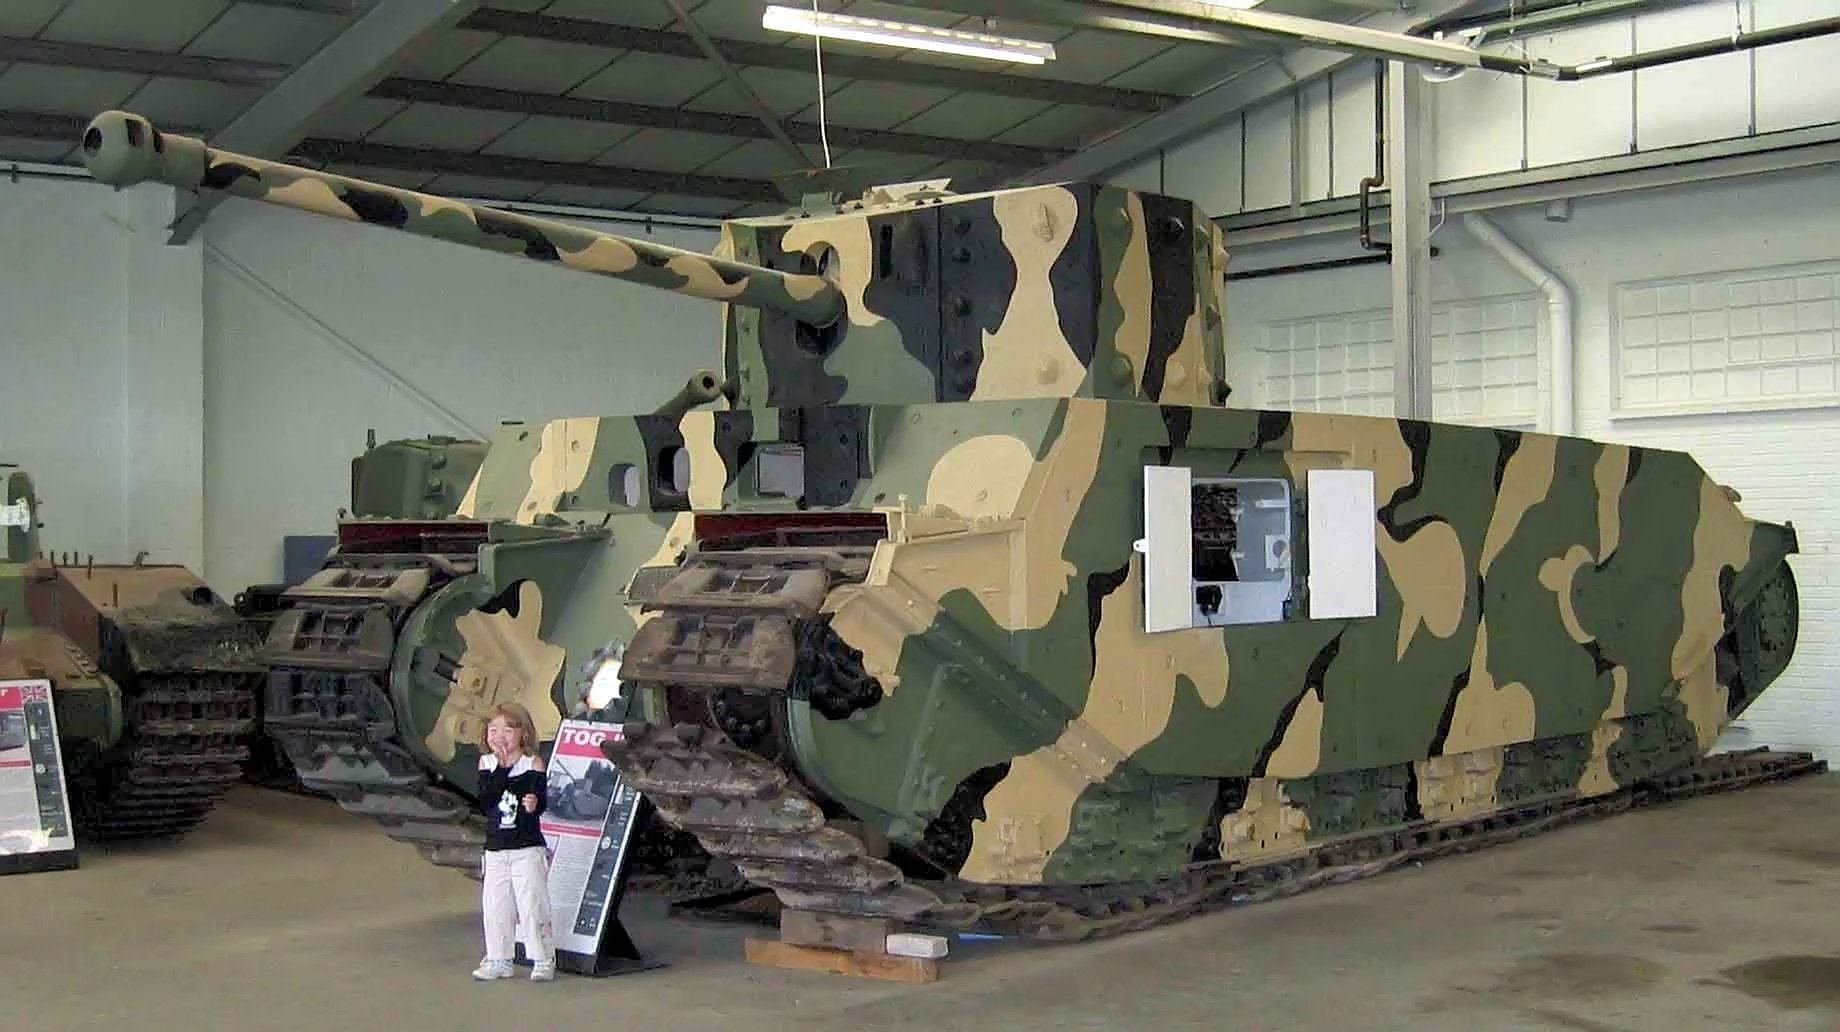 http://upload.wikimedia.org/wikipedia/commons/6/64/TOG2_Tank_Bovington.jpg